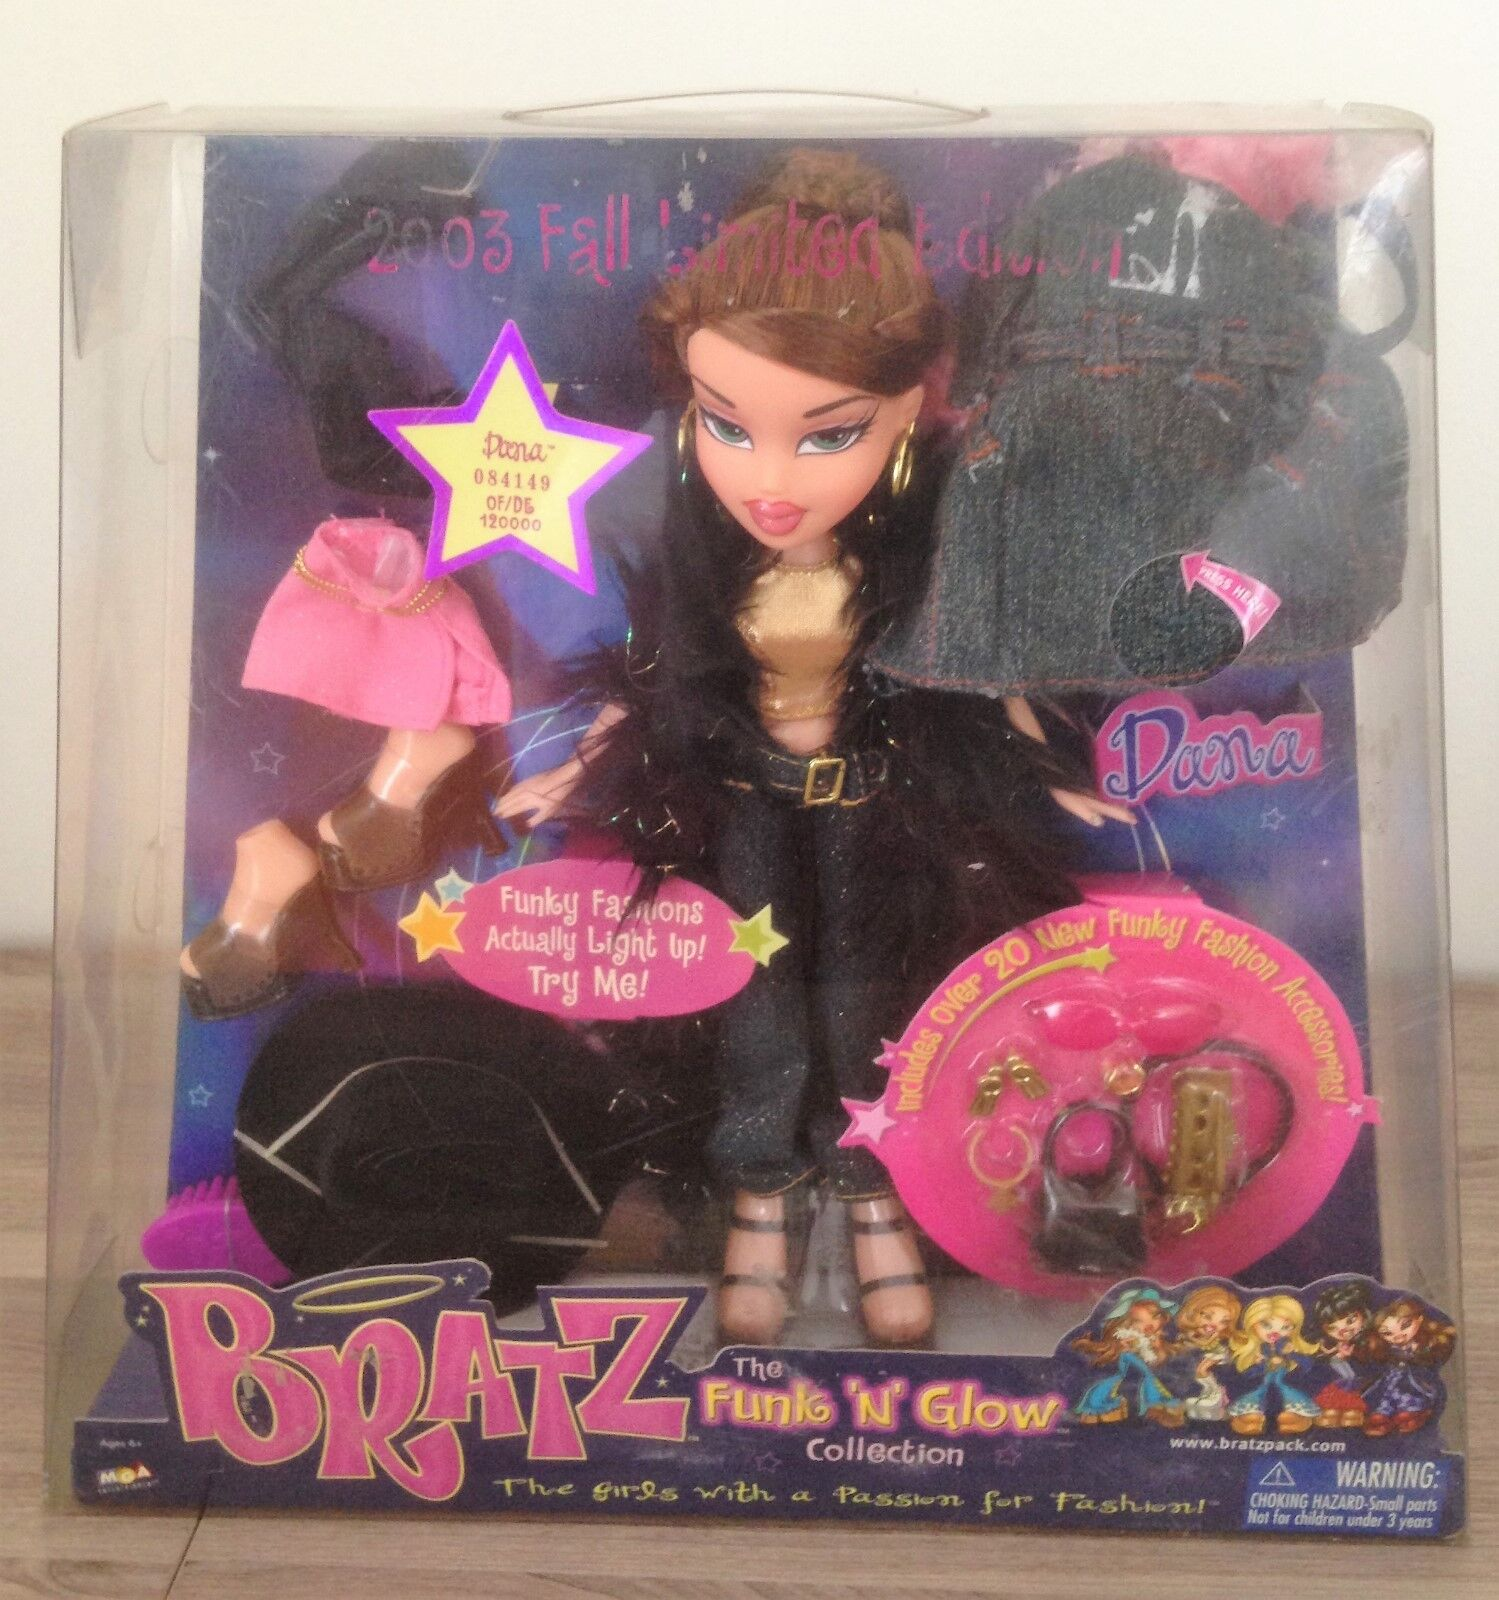 BRATZ Funk 'N Glow Collection Dana 2003 Fall Limited Edition MGA NEW